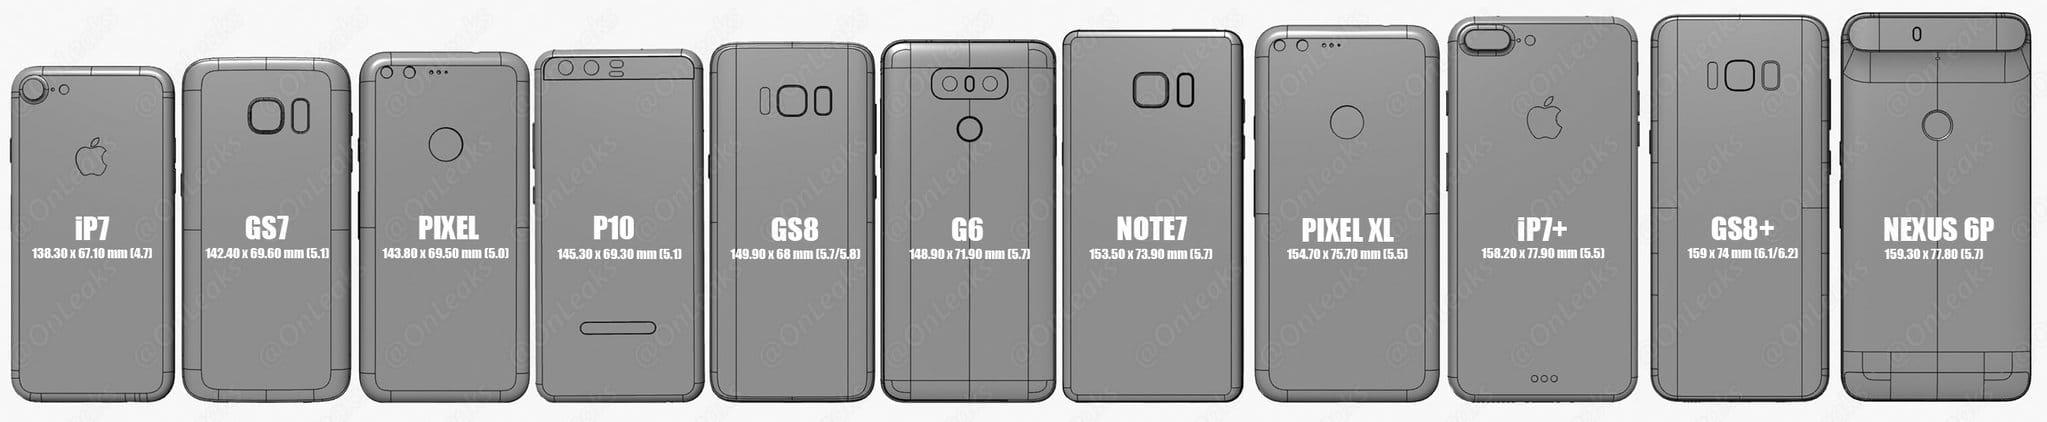 Samsung Galaxy S7 size iPhone 7 Plus 1